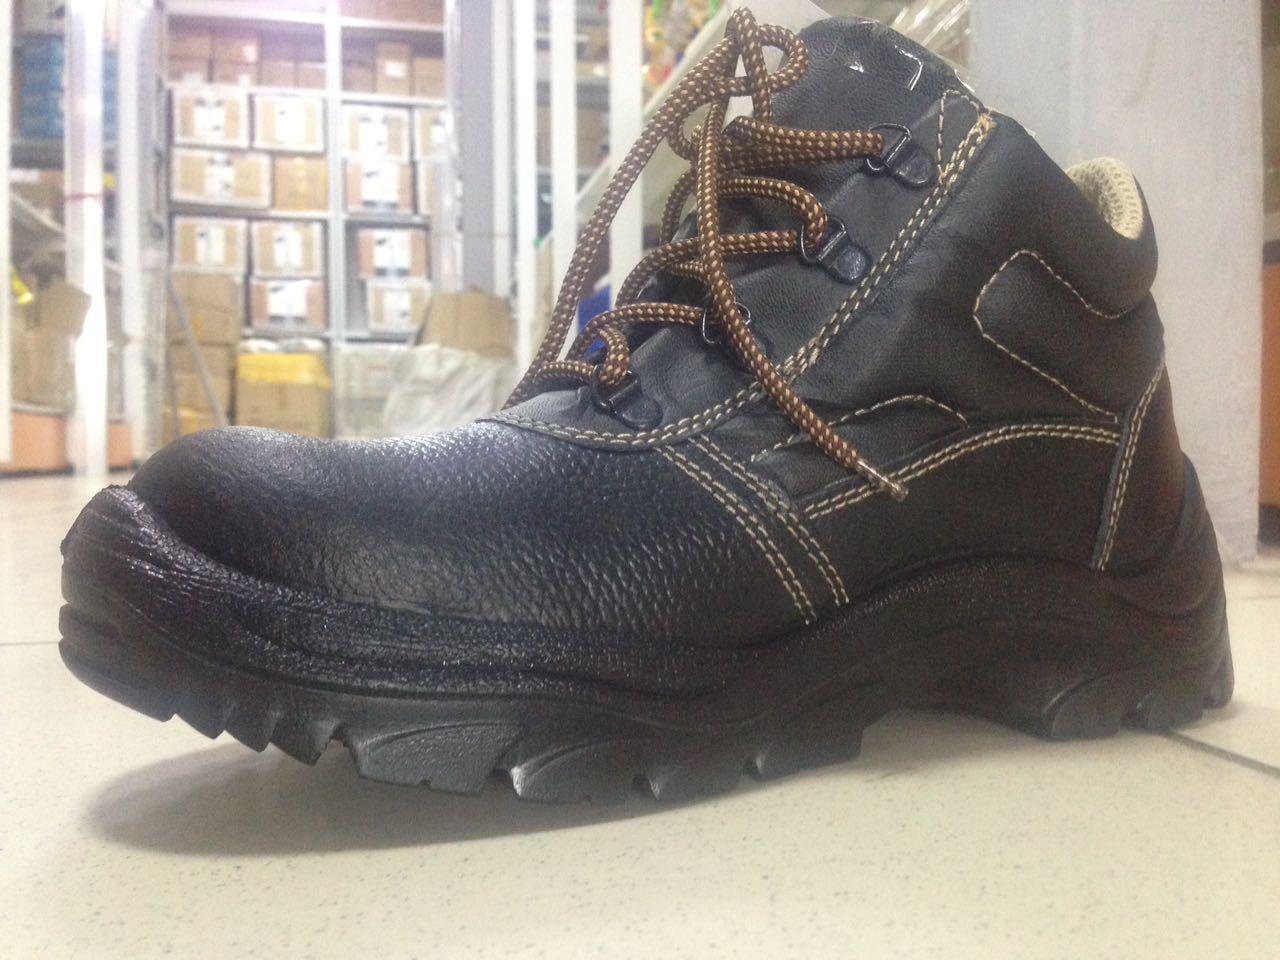 Ботинки кожаные СТИКС ПУ с МП (БОТ 341)